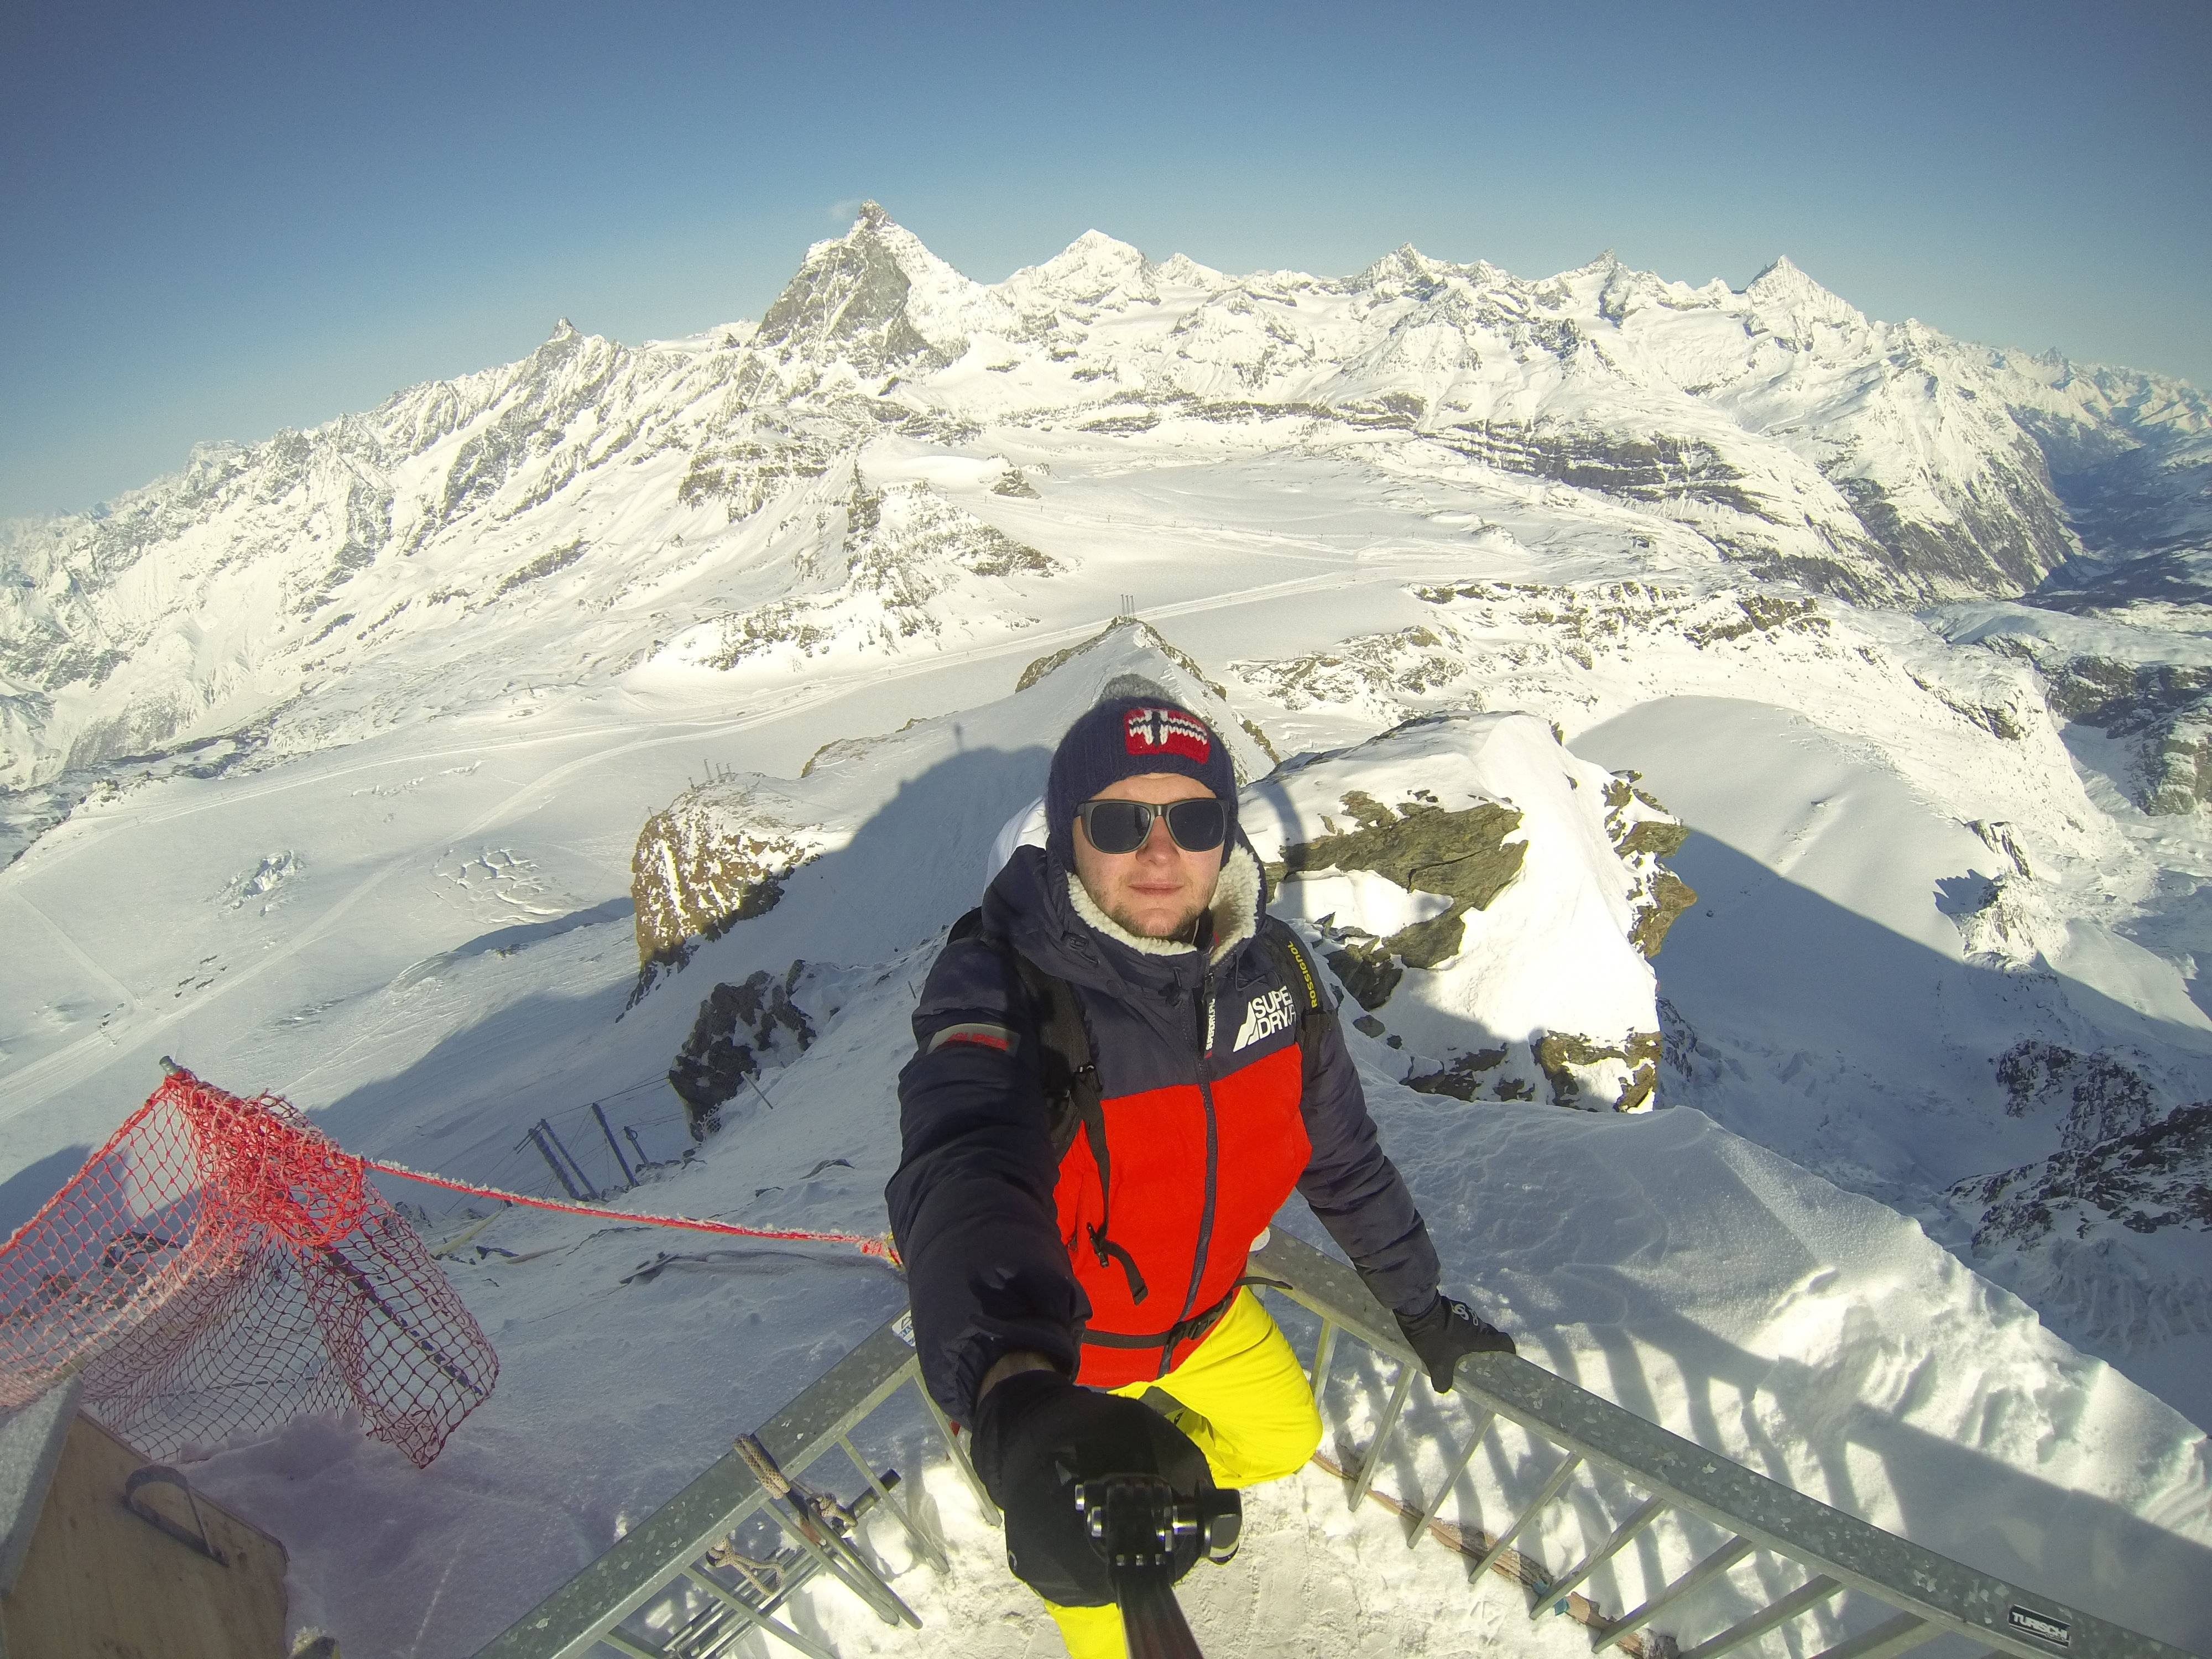 Photo 3: Zermatt : vue sur la montagne de Toblerone !